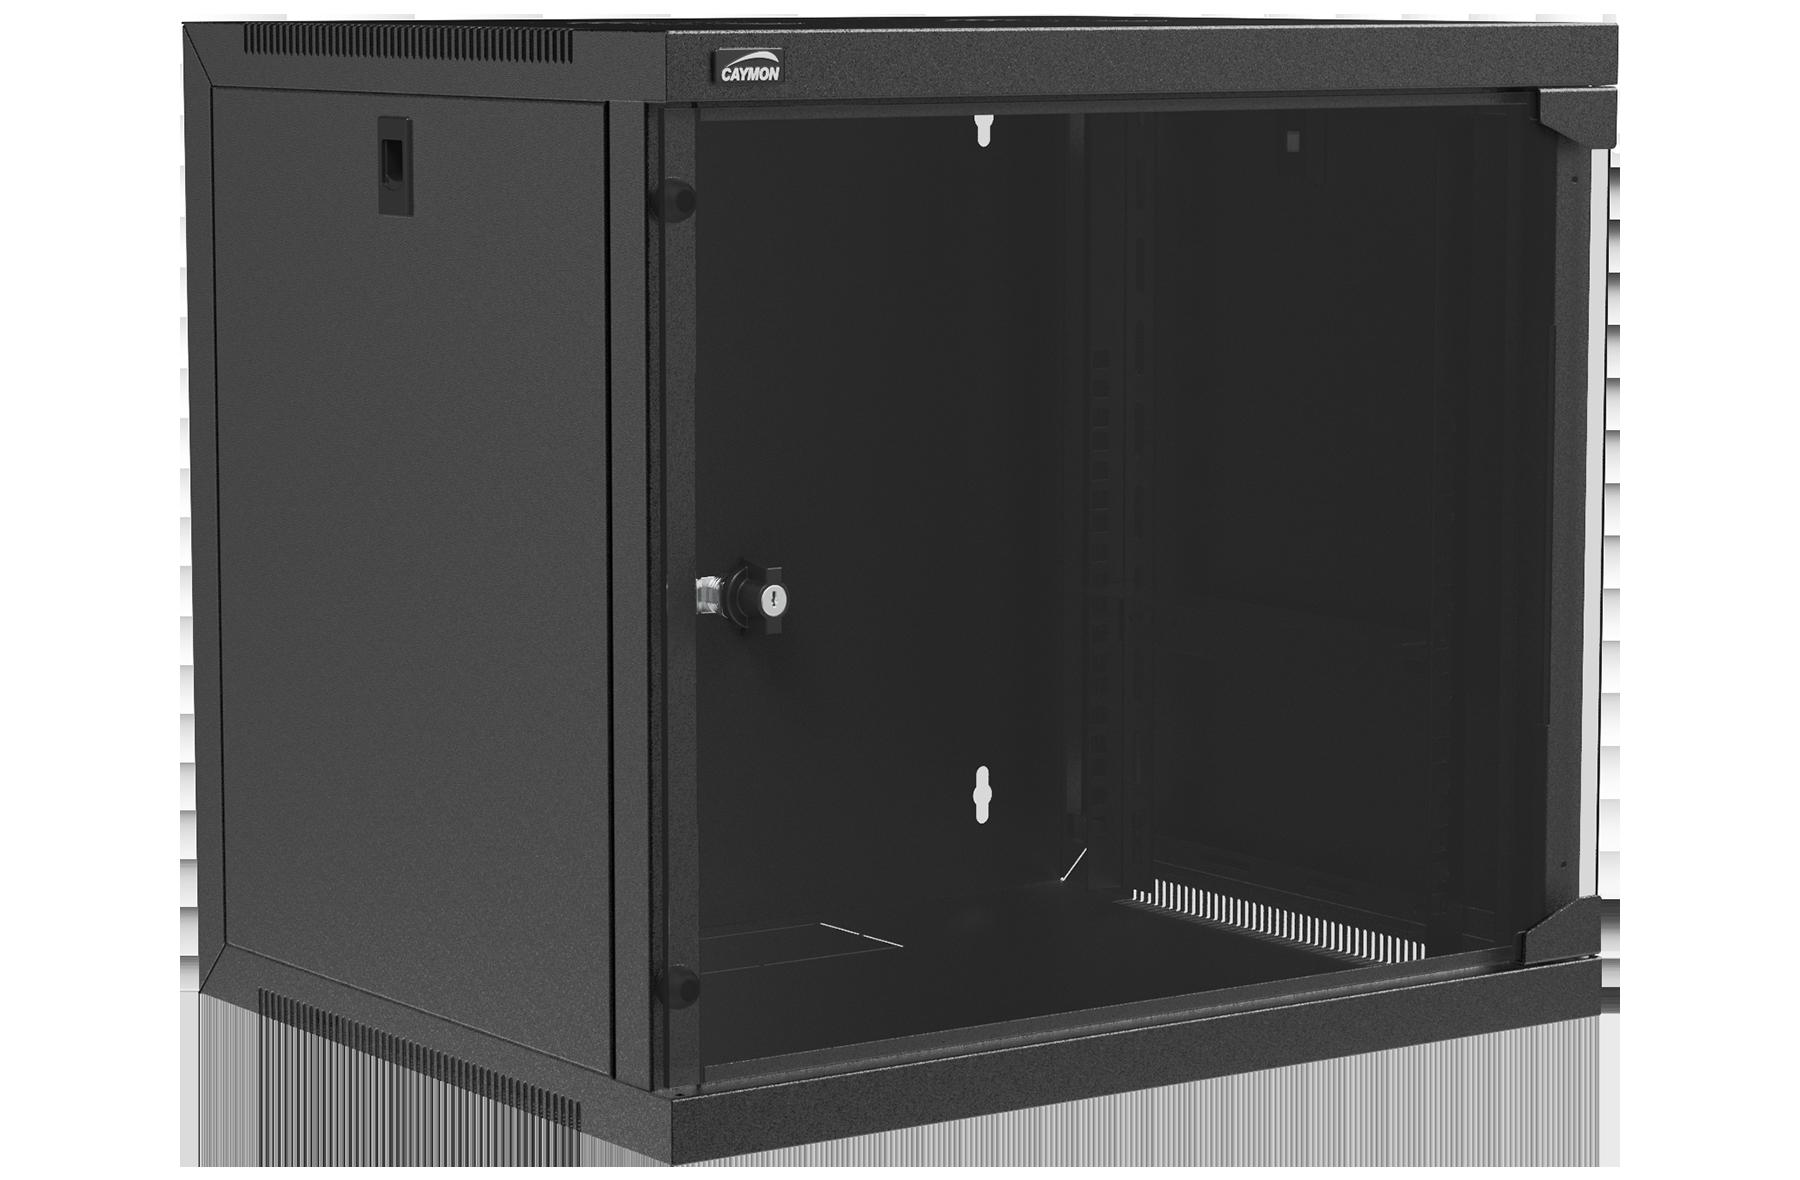 "EPR409 - 19"" wall rack - 9 units - 450 mm depth"